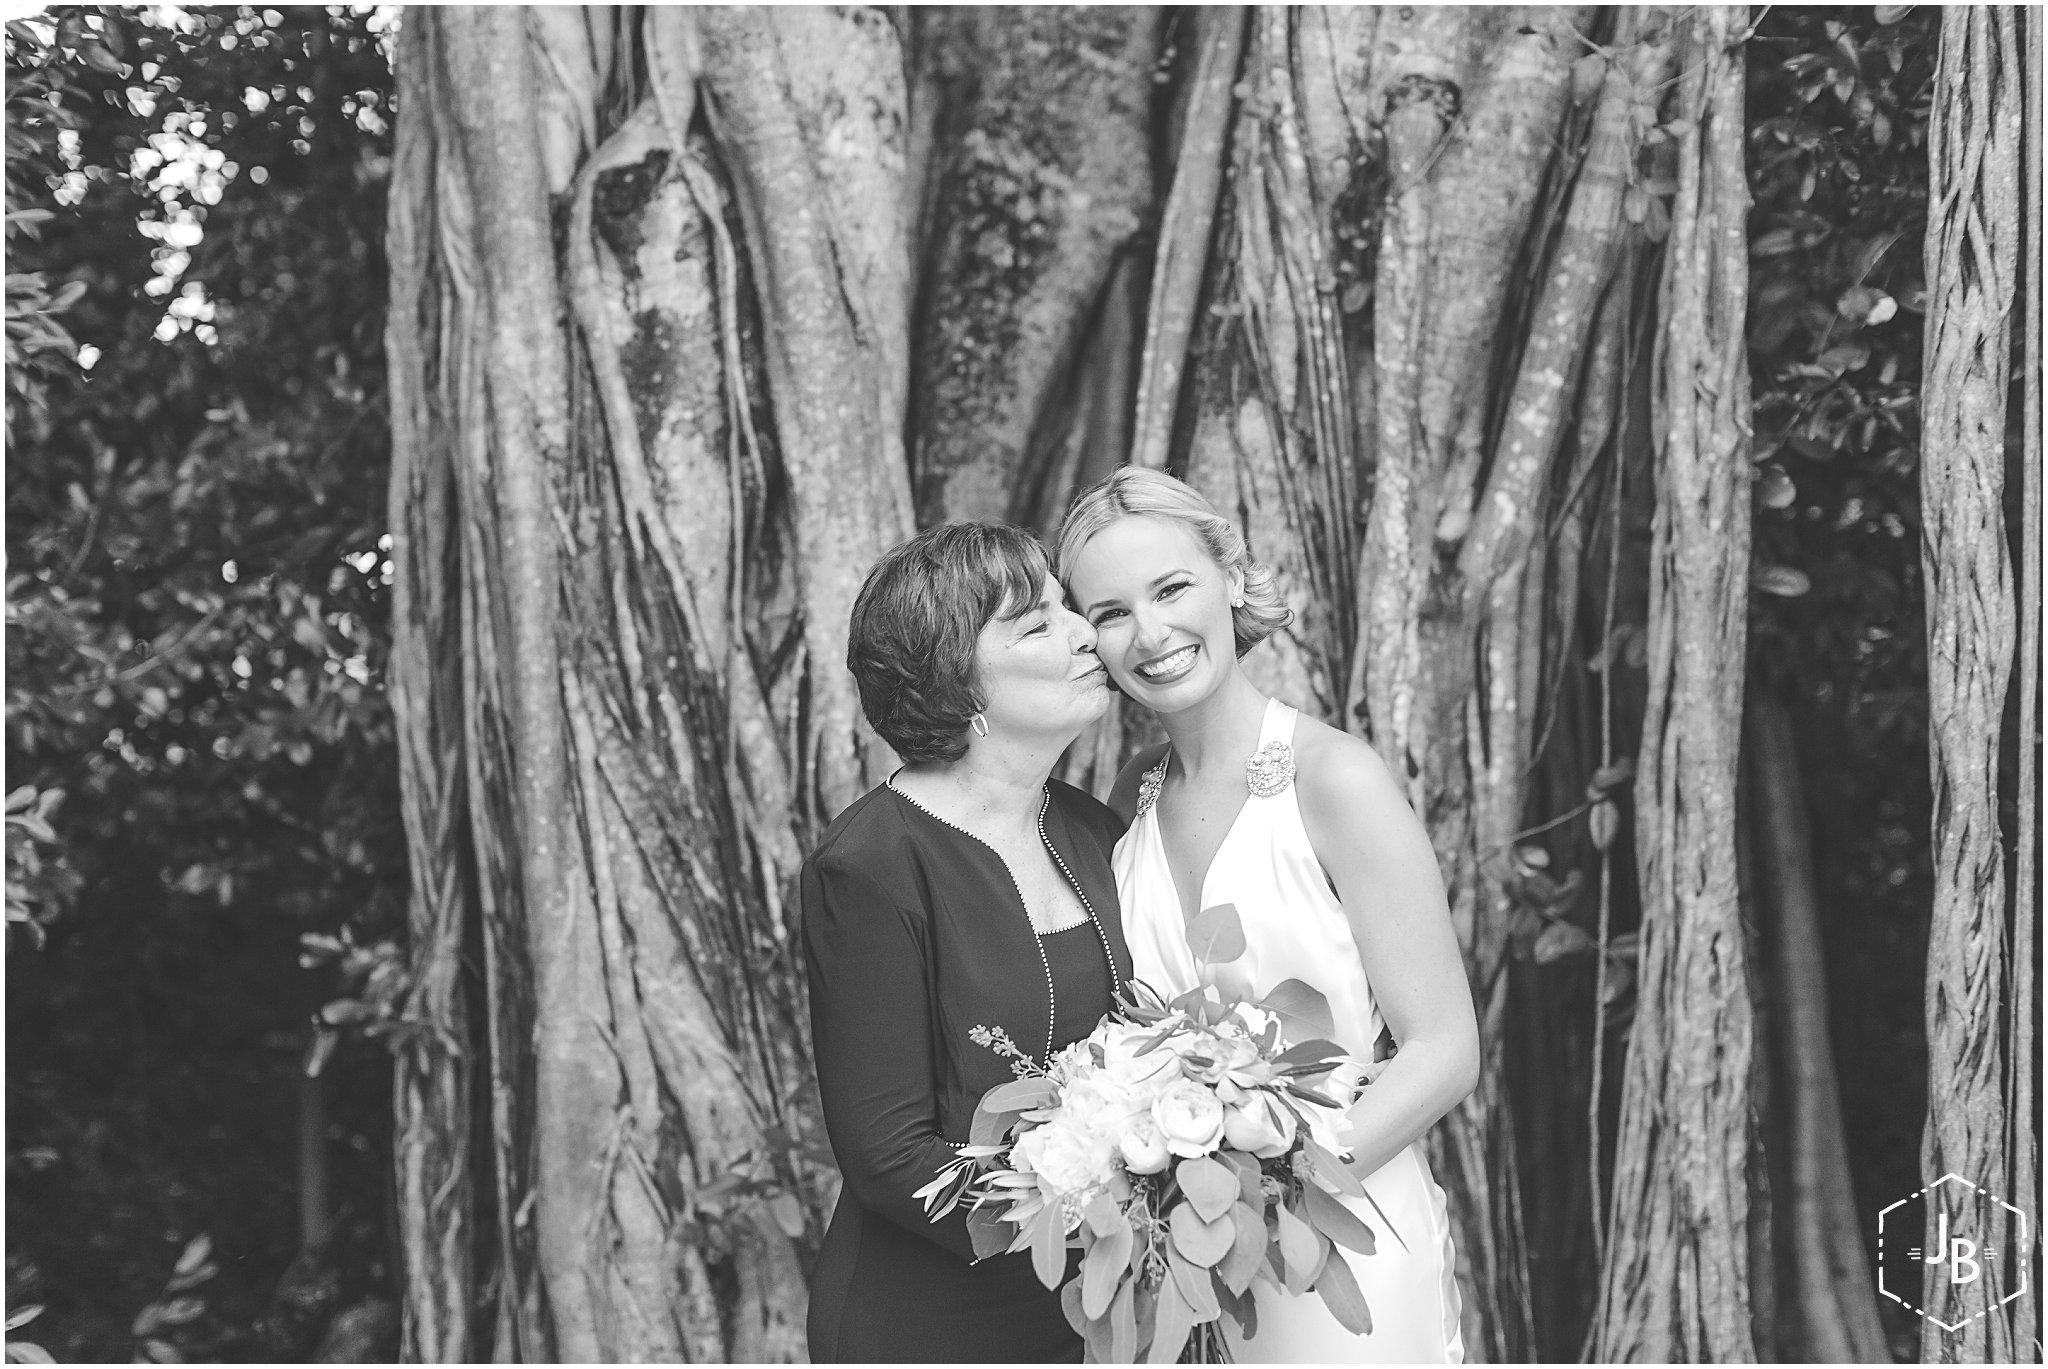 WeddingandEngagementFloridaPhotographer_1135.jpg